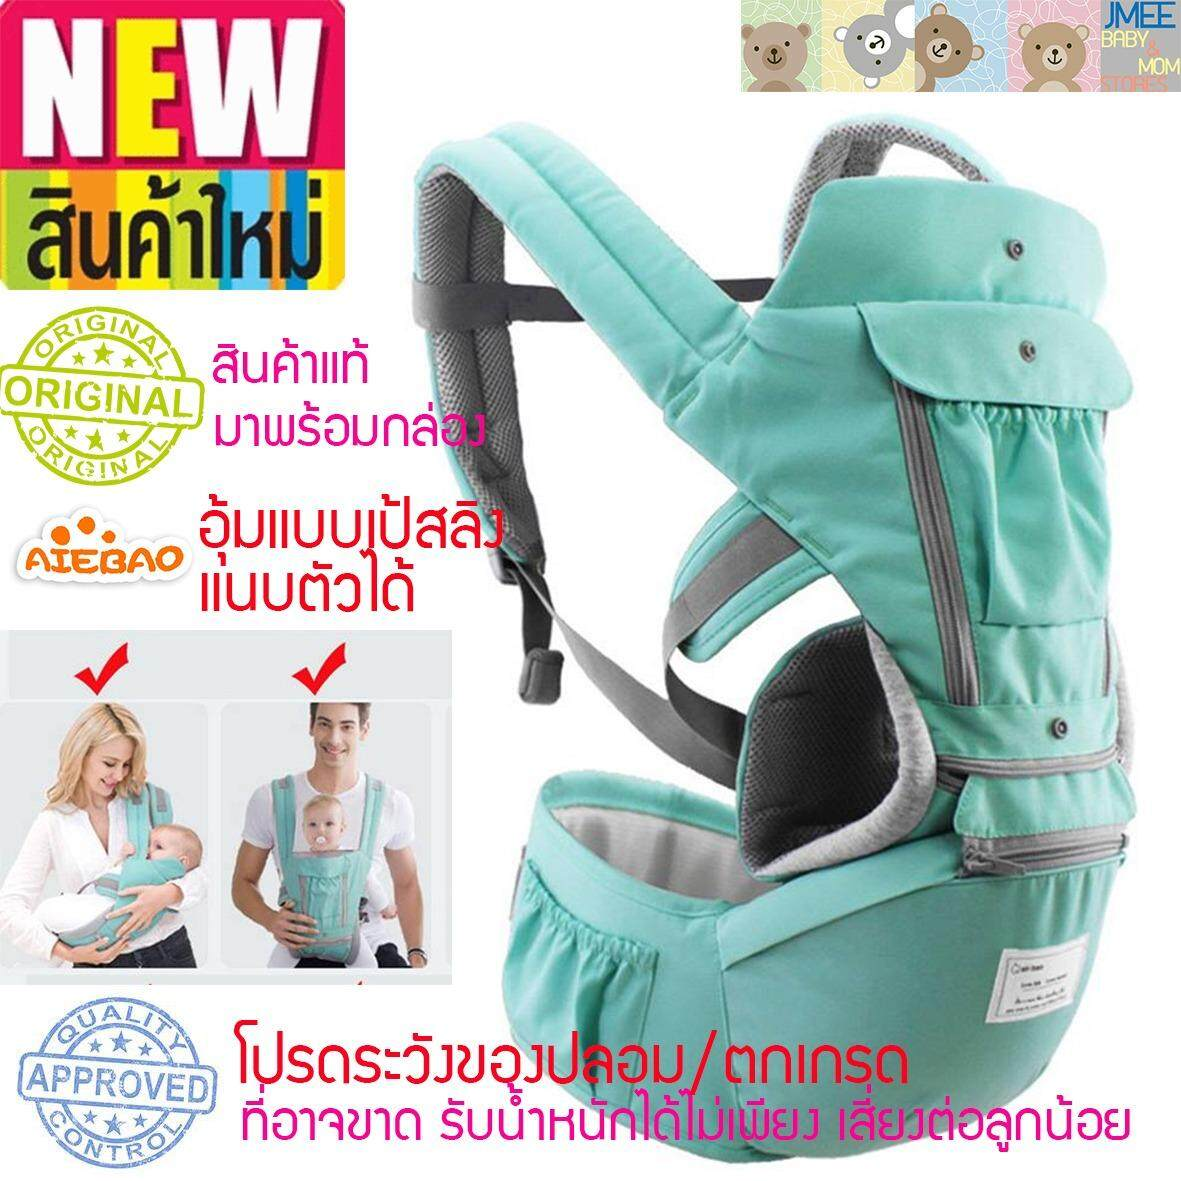 JMEE BABY LOVE เป้อุ้มเด็กนั่ง aiebao ของแท้ Hip Seat 3 in 1 เขียว พาสเทล (Pastel) สะพายหน้าและสะพายหลังได้